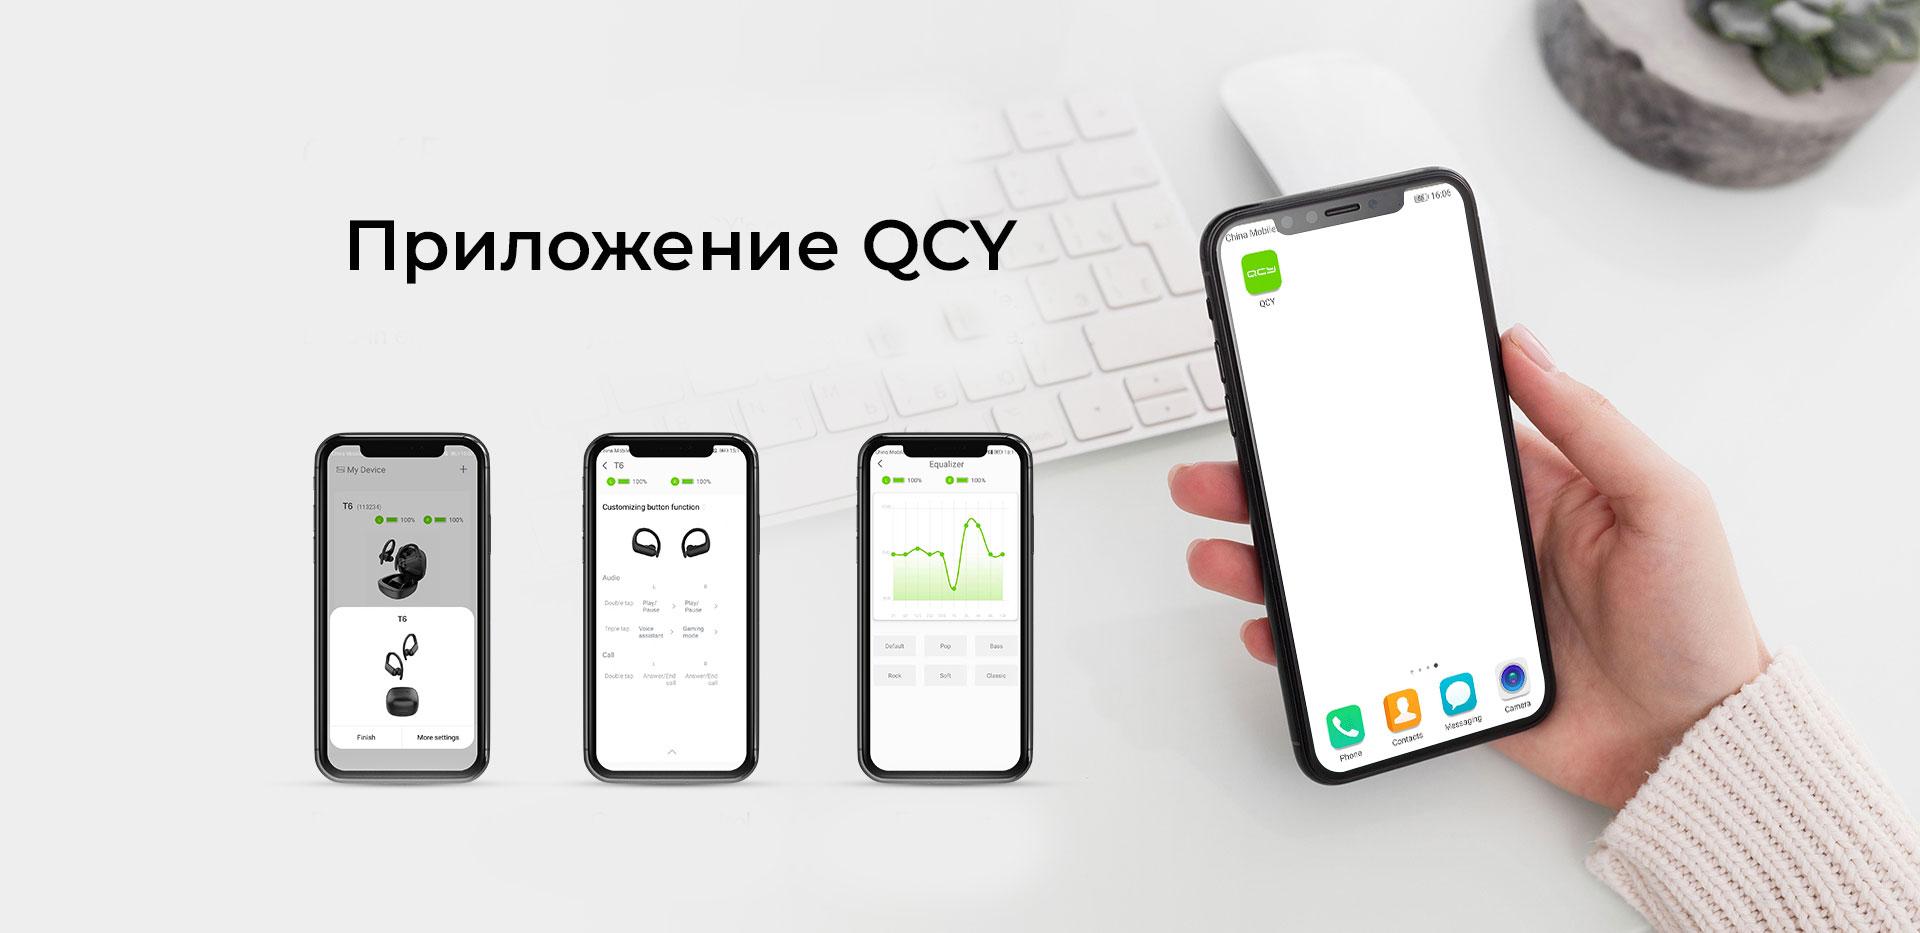 Opisanie Besprovodnye Naushniki Xiaomi Qcy T6 3